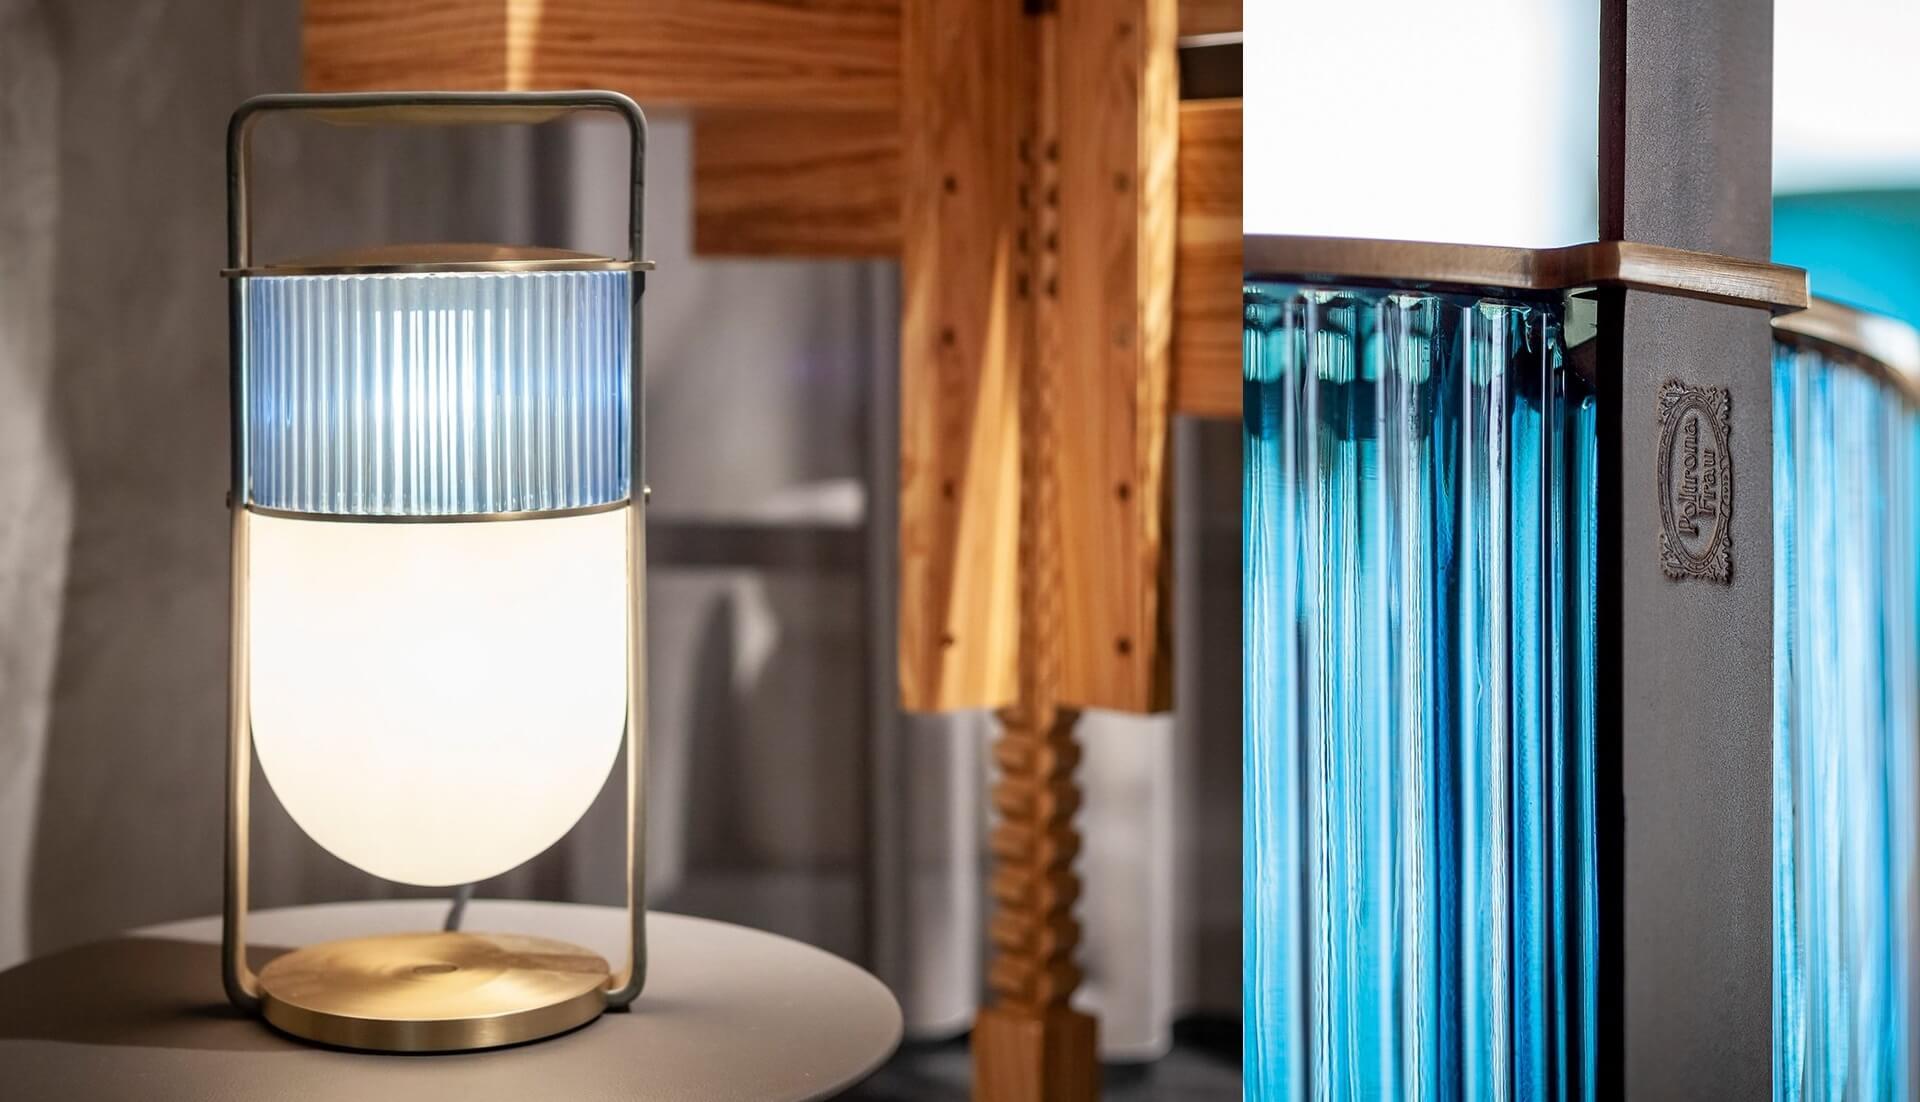 Poltrona Frau Xi Table Lamp